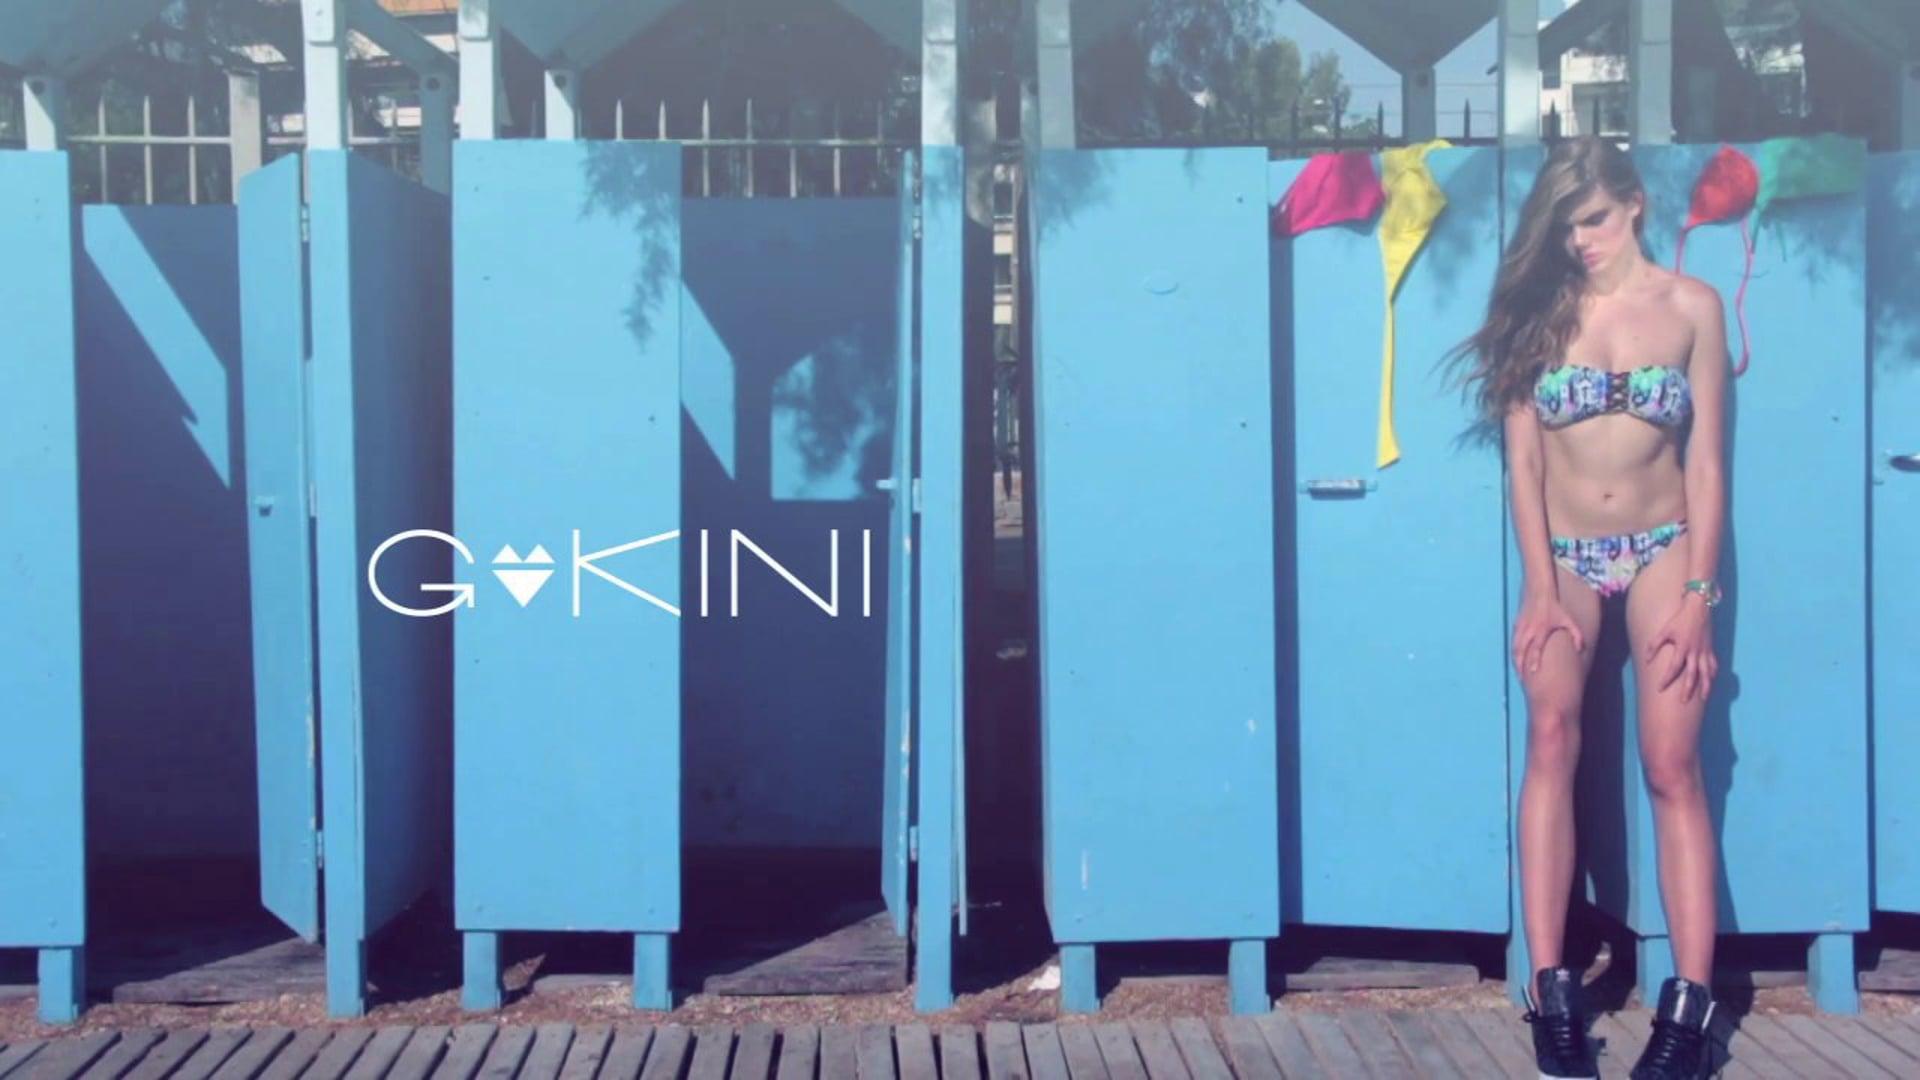 Gkini Promo Video | Films In A Bag